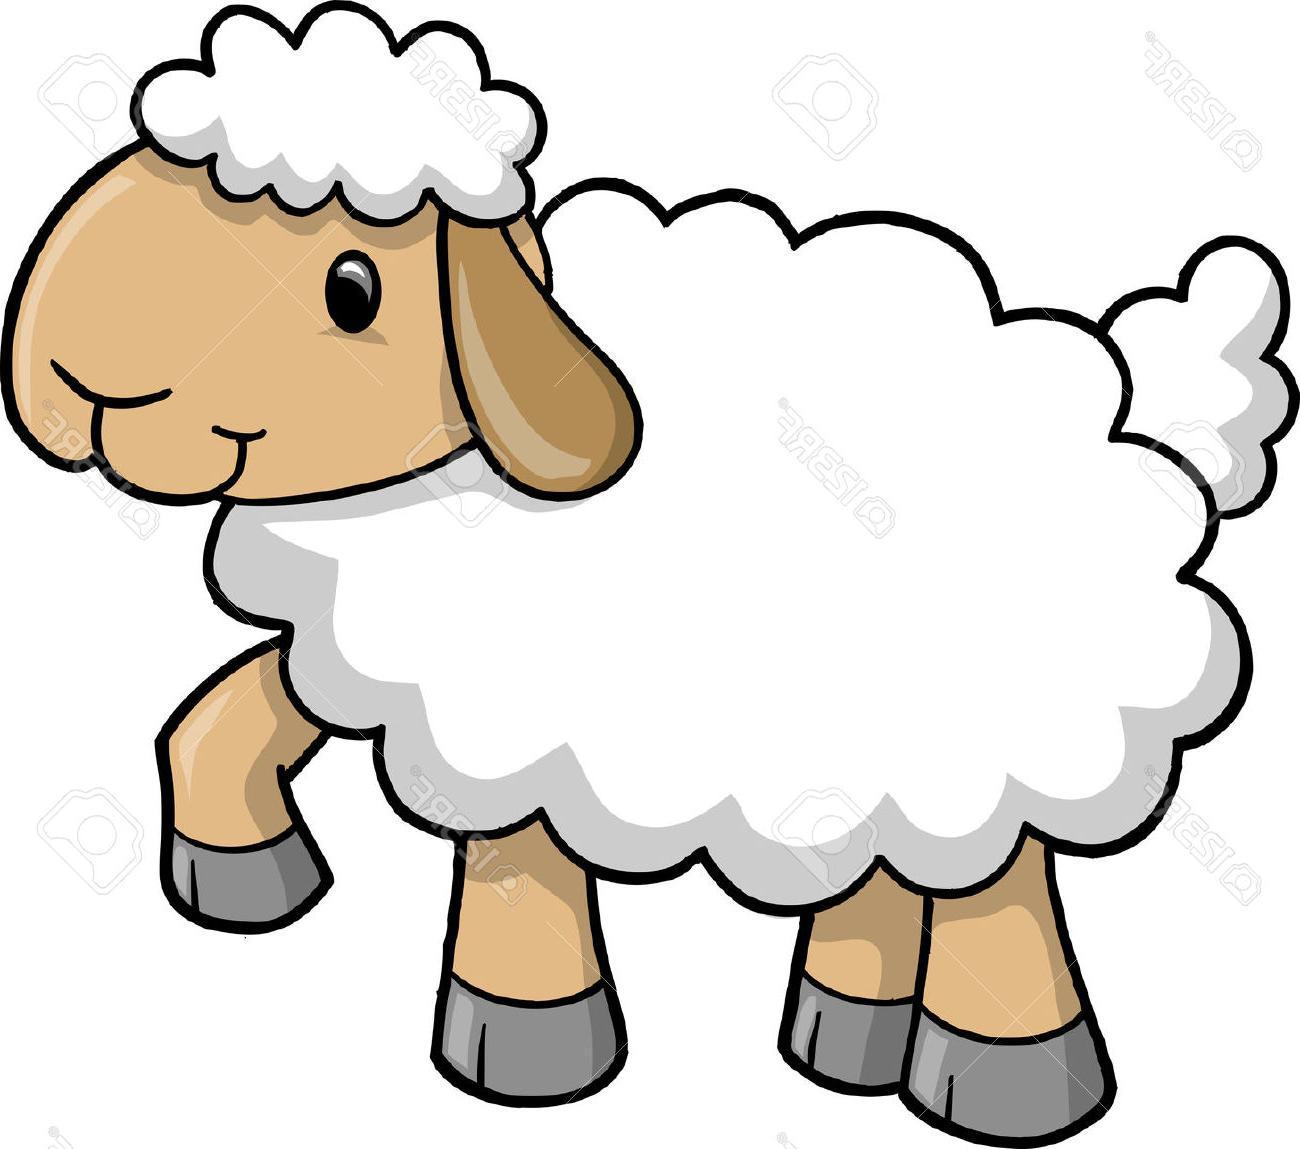 Free Clipart Lamb | Free download best Free Clipart Lamb ...